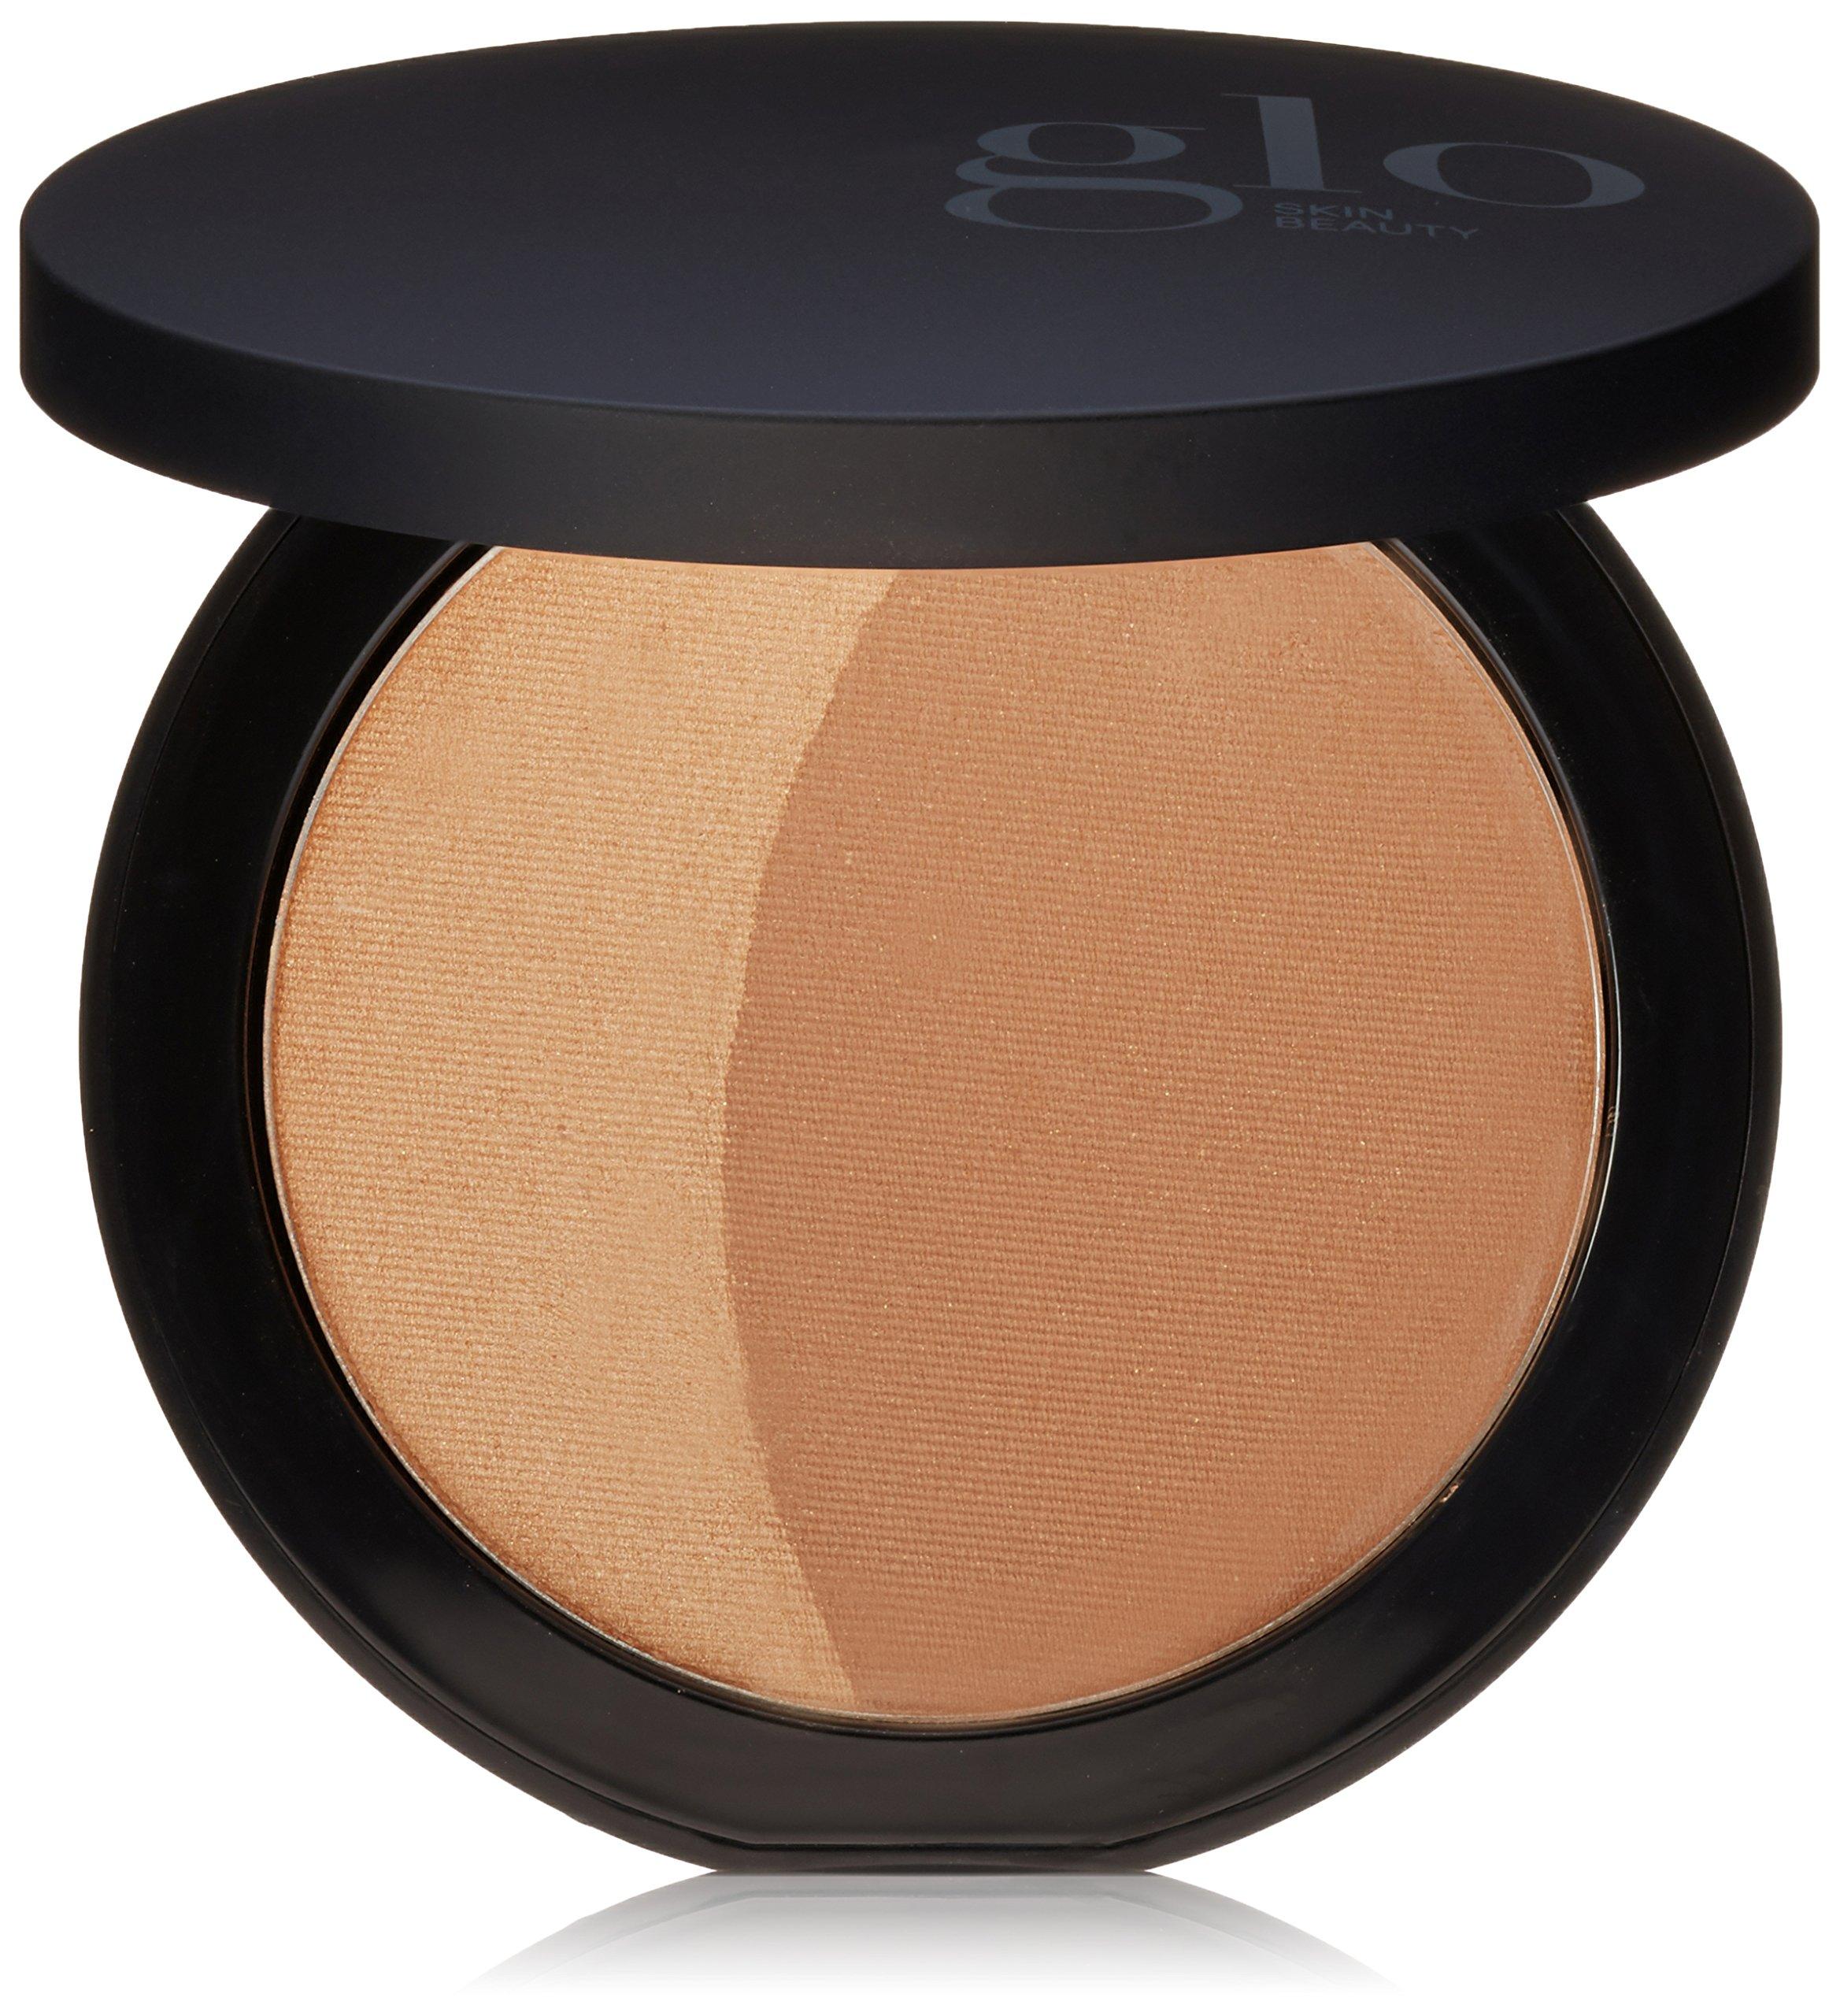 Glo Skin Beauty Bronze - Sunkiss, Mineral Makeup Bronzer Powder, 2 Shades | Noncomedogenic, Cruelty Free